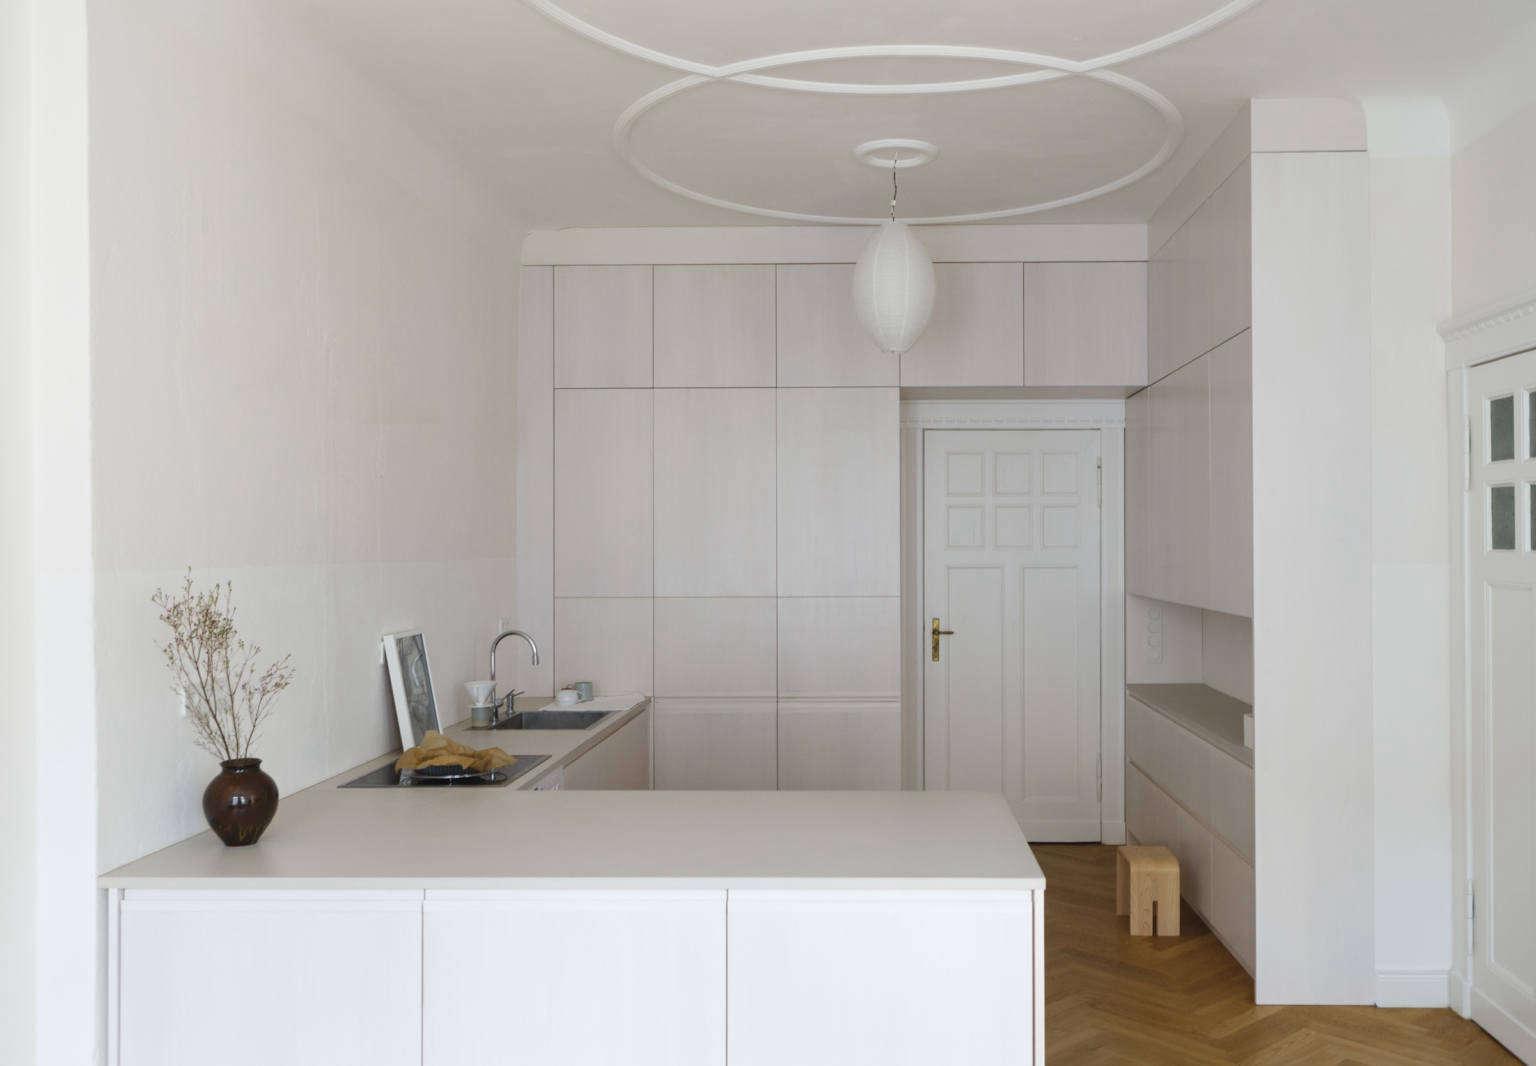 berlin apartment kitchen by studio oink 2